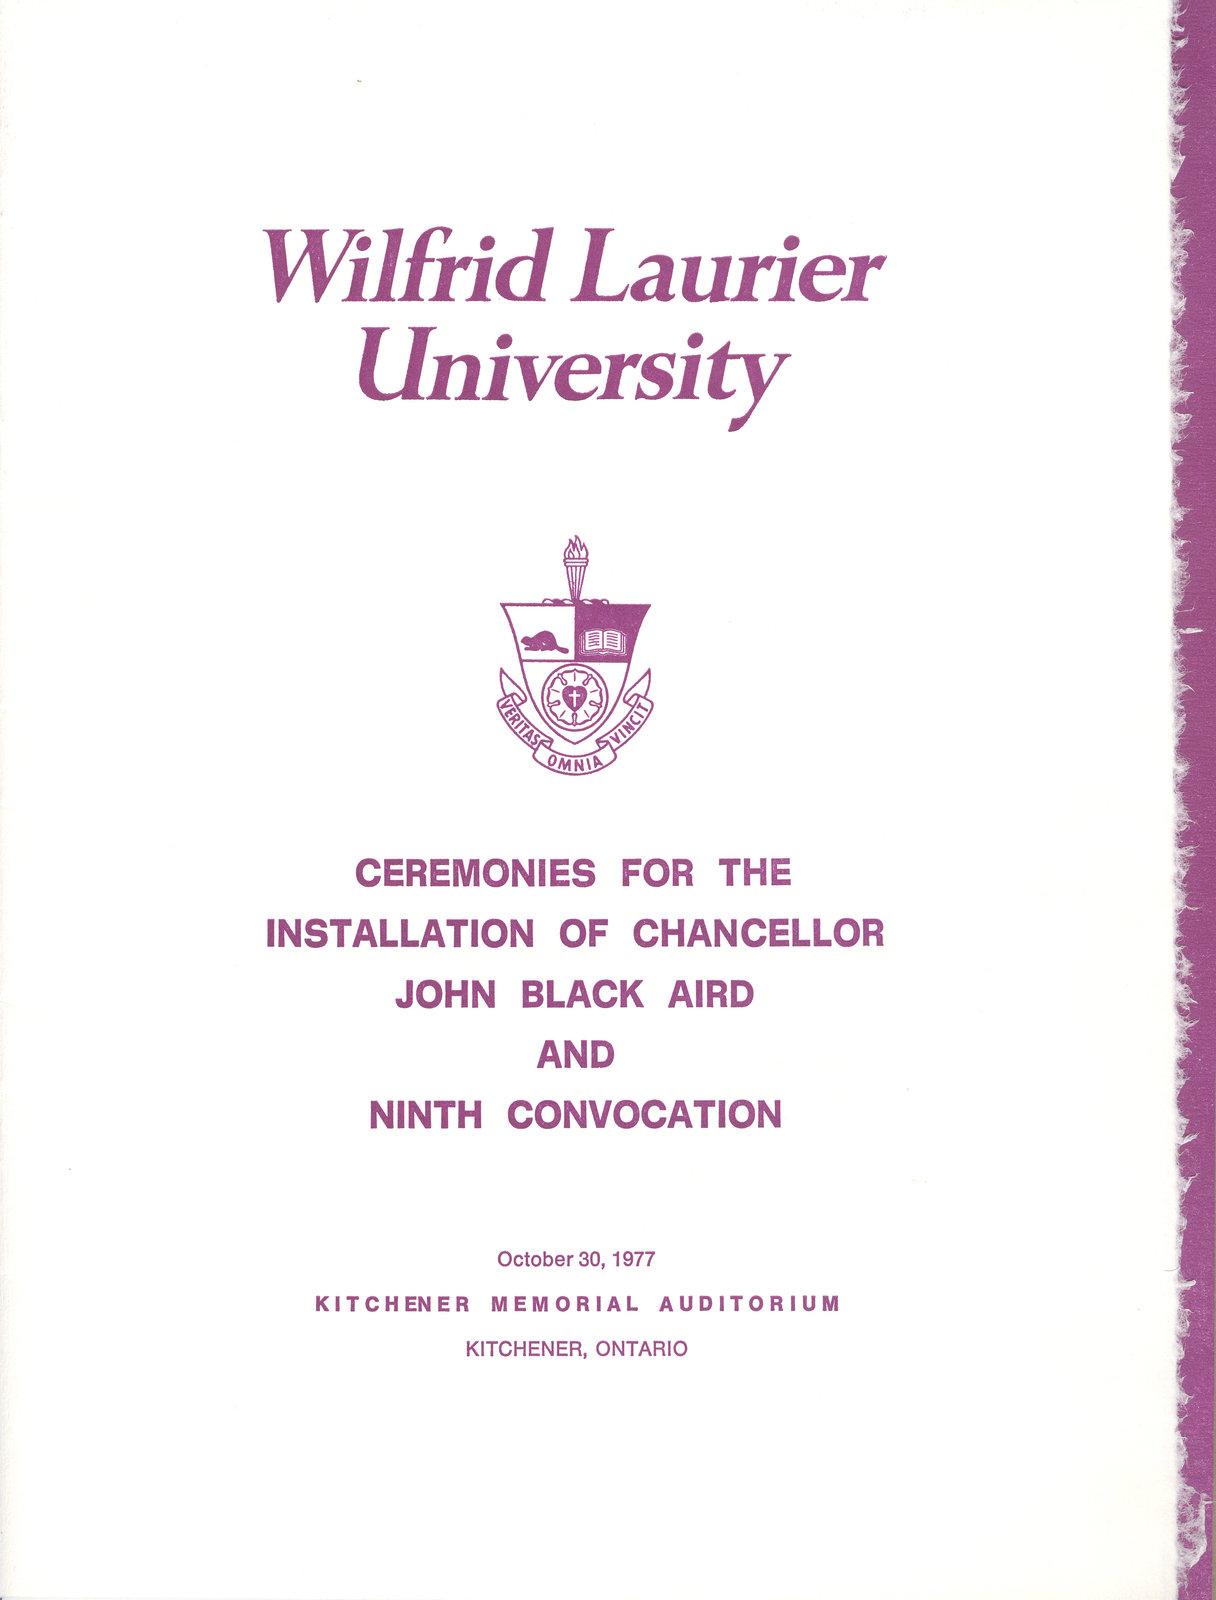 Wilfrid Laurier University fall convocation 1977 program